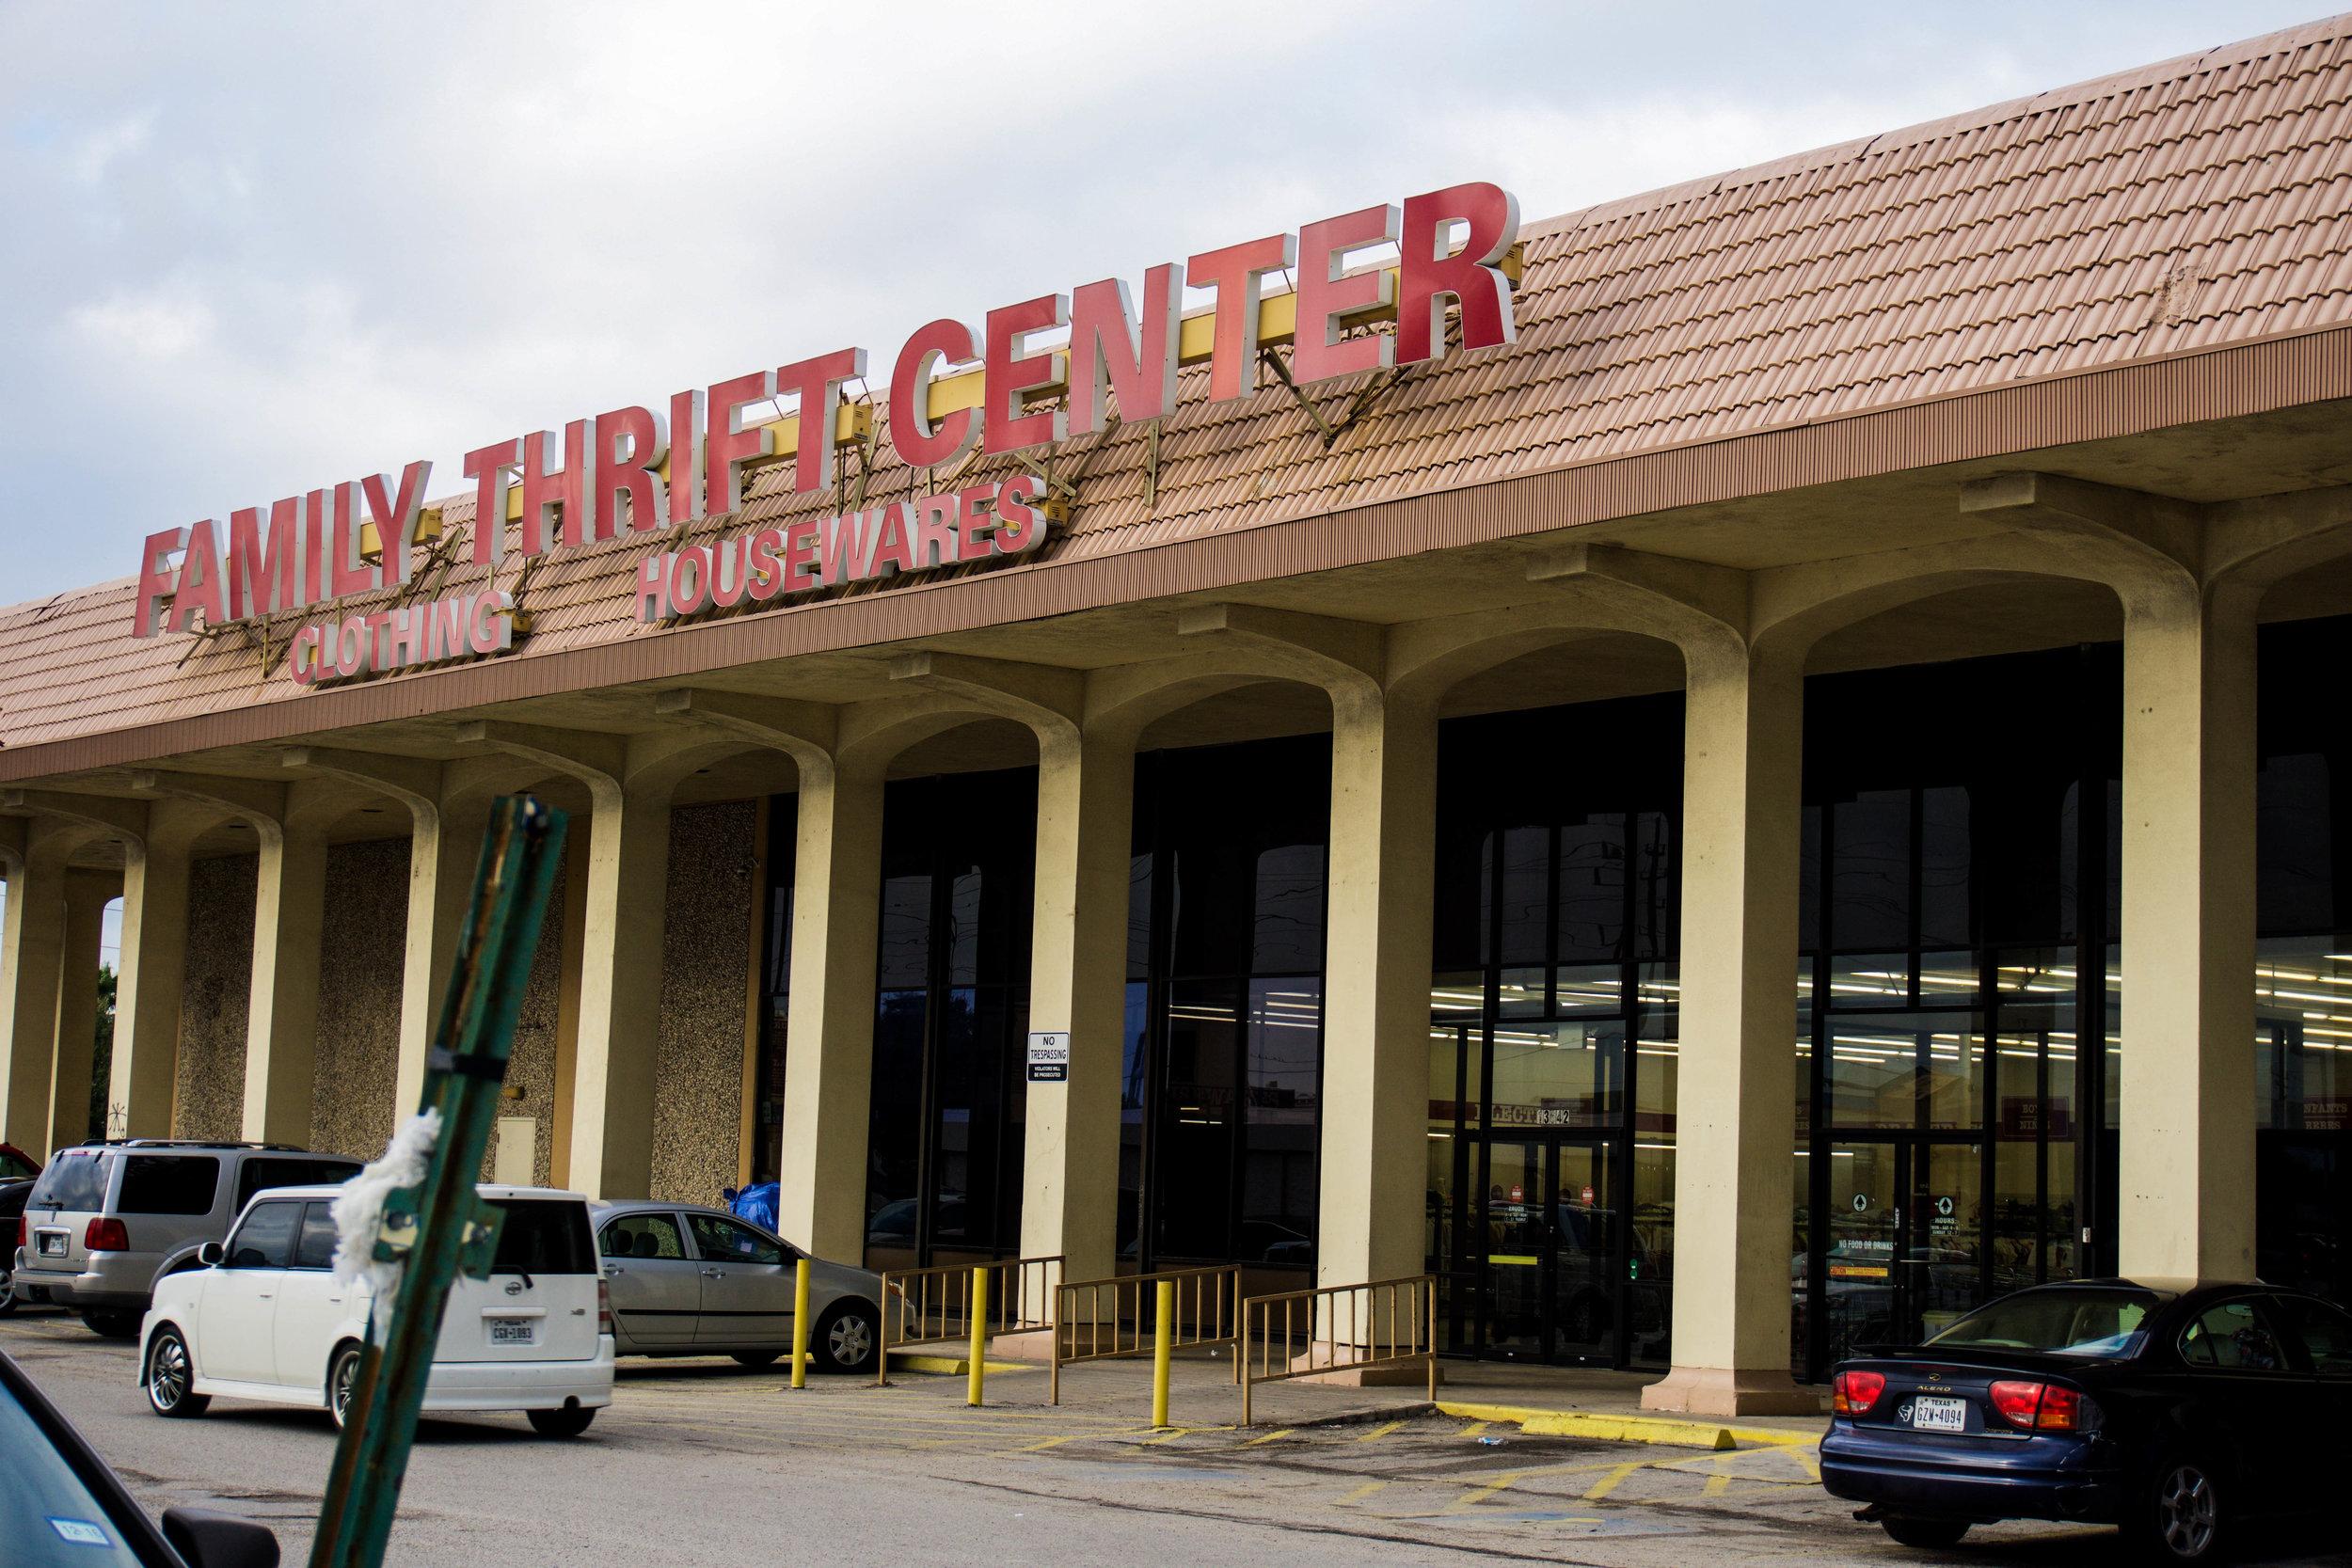 Family Thrift Center Thrift Store Review